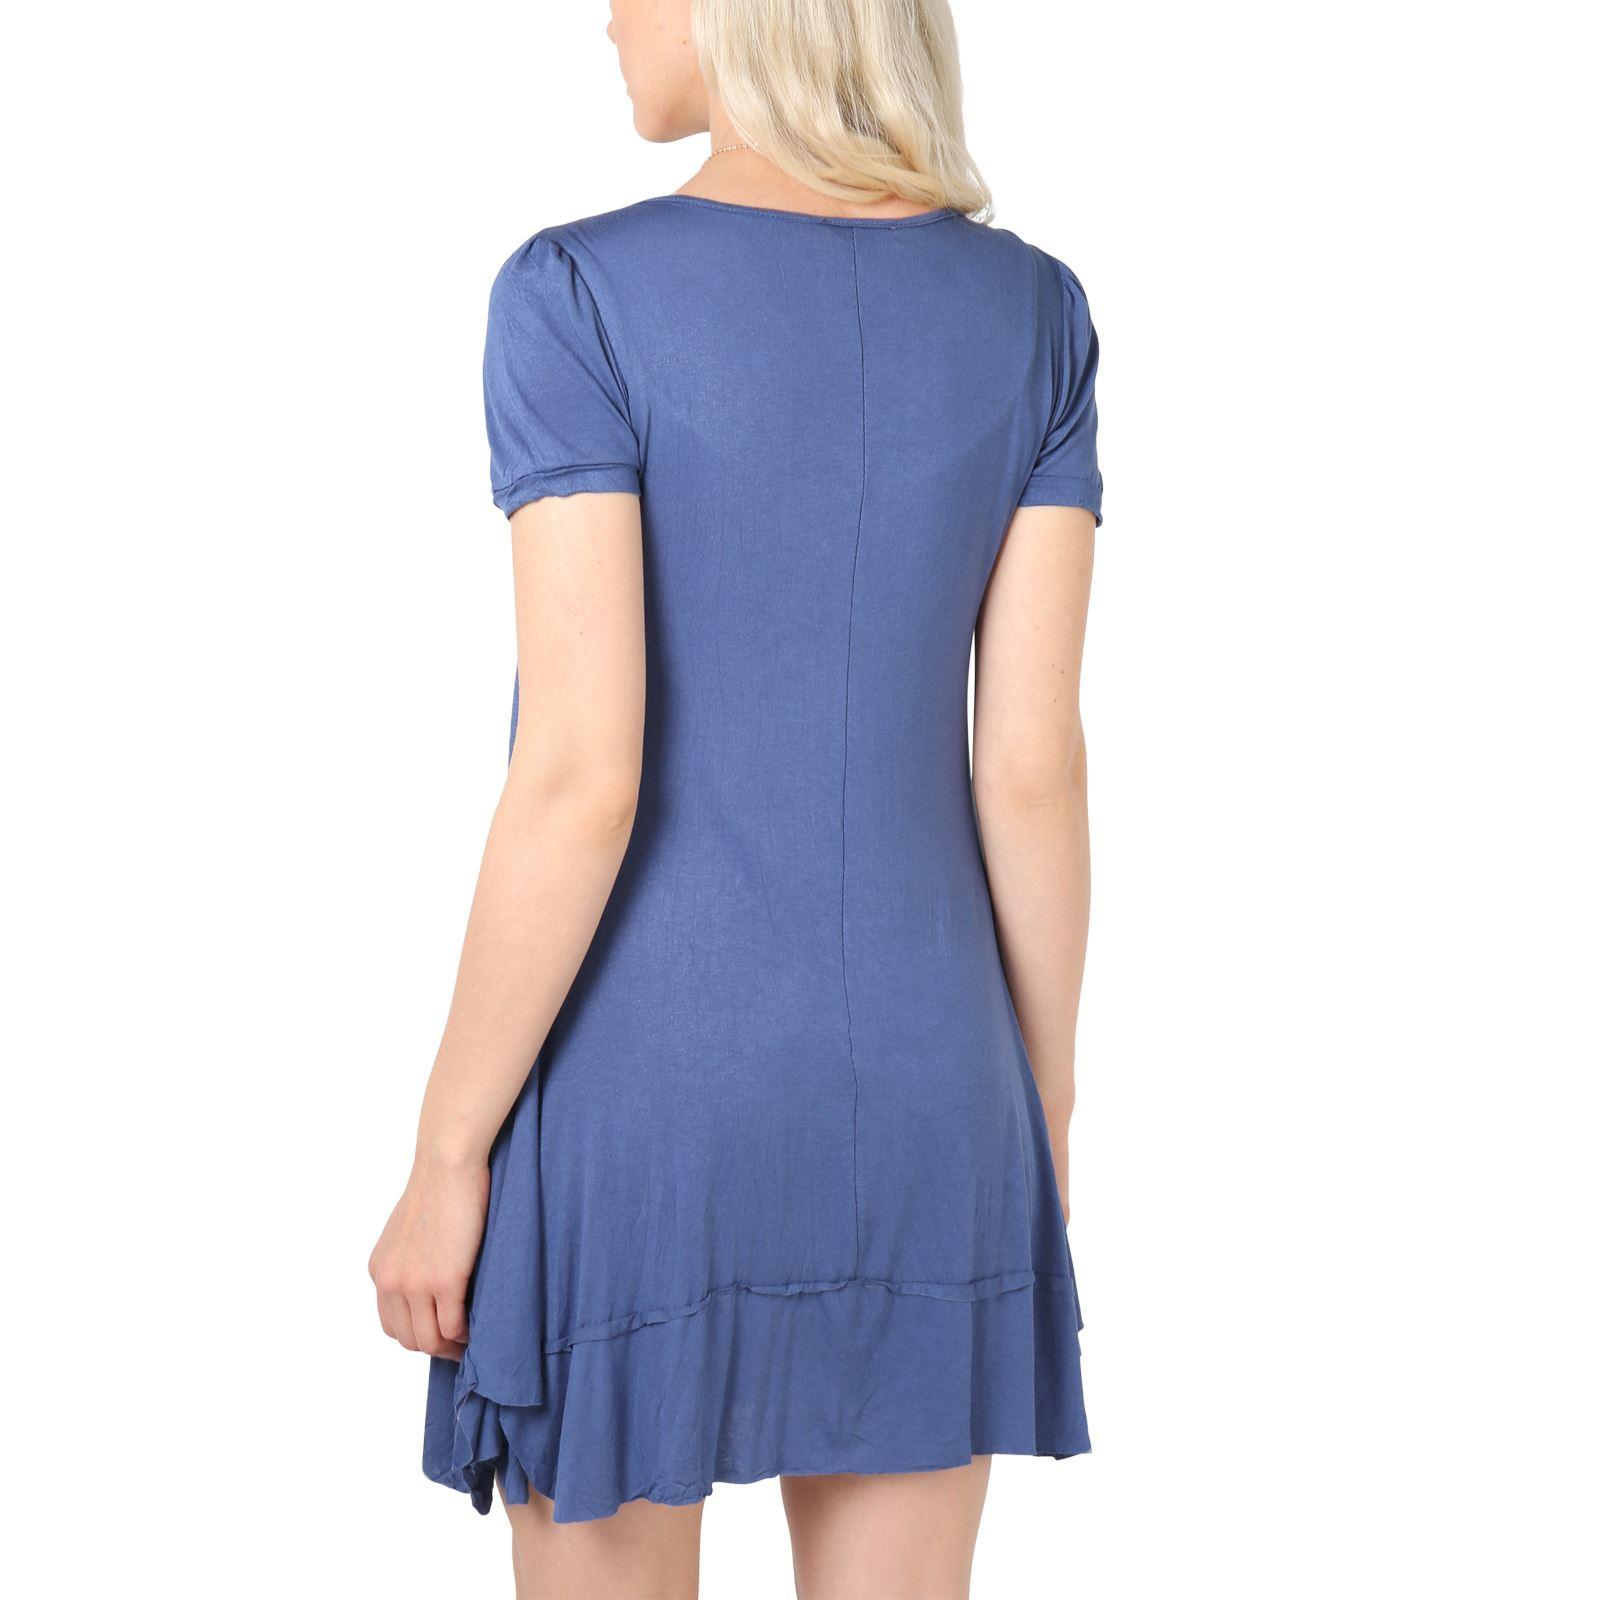 KRISP-Women-2-in-1-Boho-Gypsy-Tunic-Dress-Top-Tee-Jersey-Pleated-A-Line-Necklace thumbnail 10